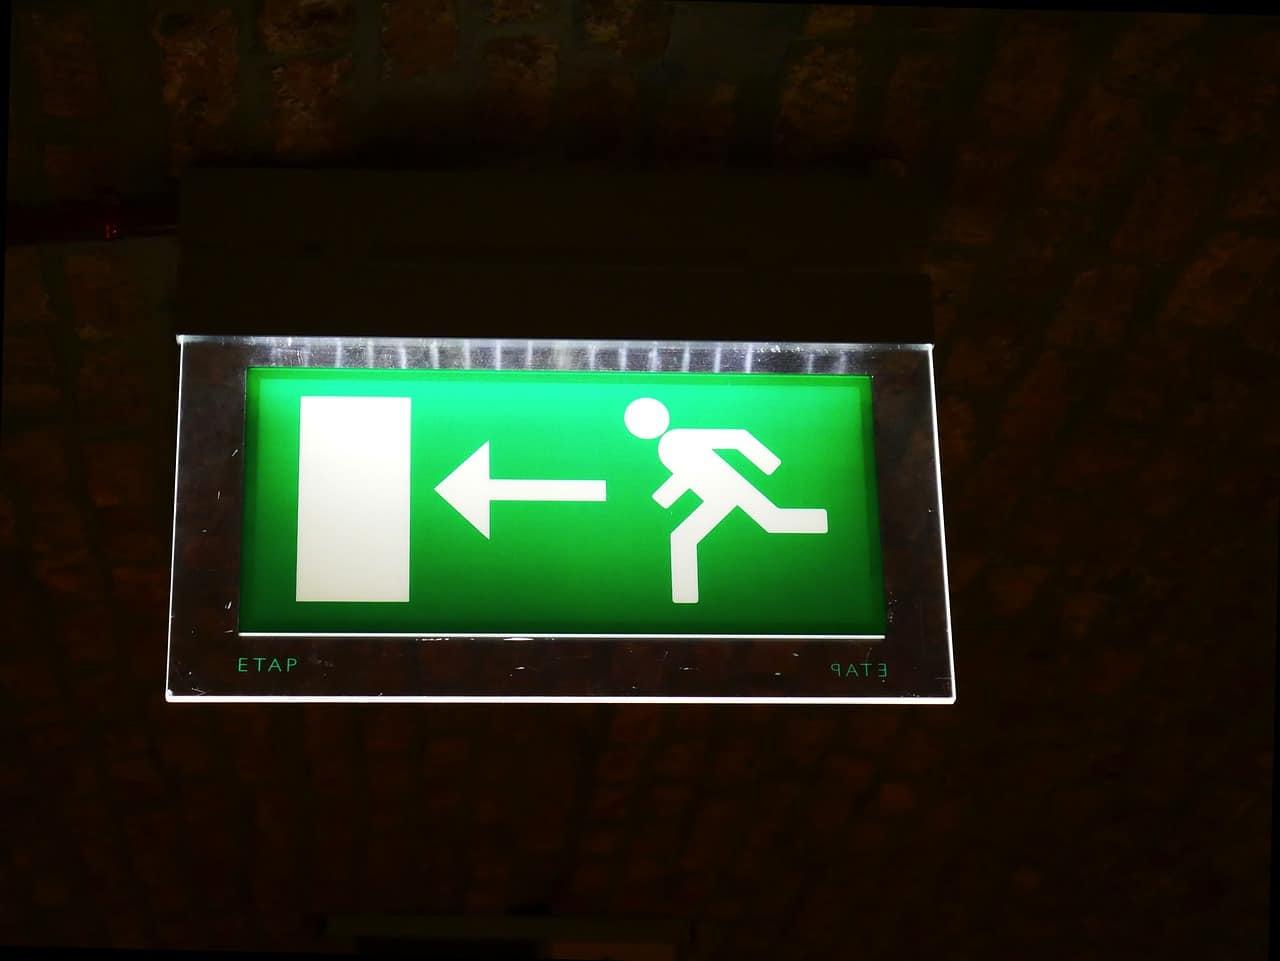 instalar-luces-de-emergencia